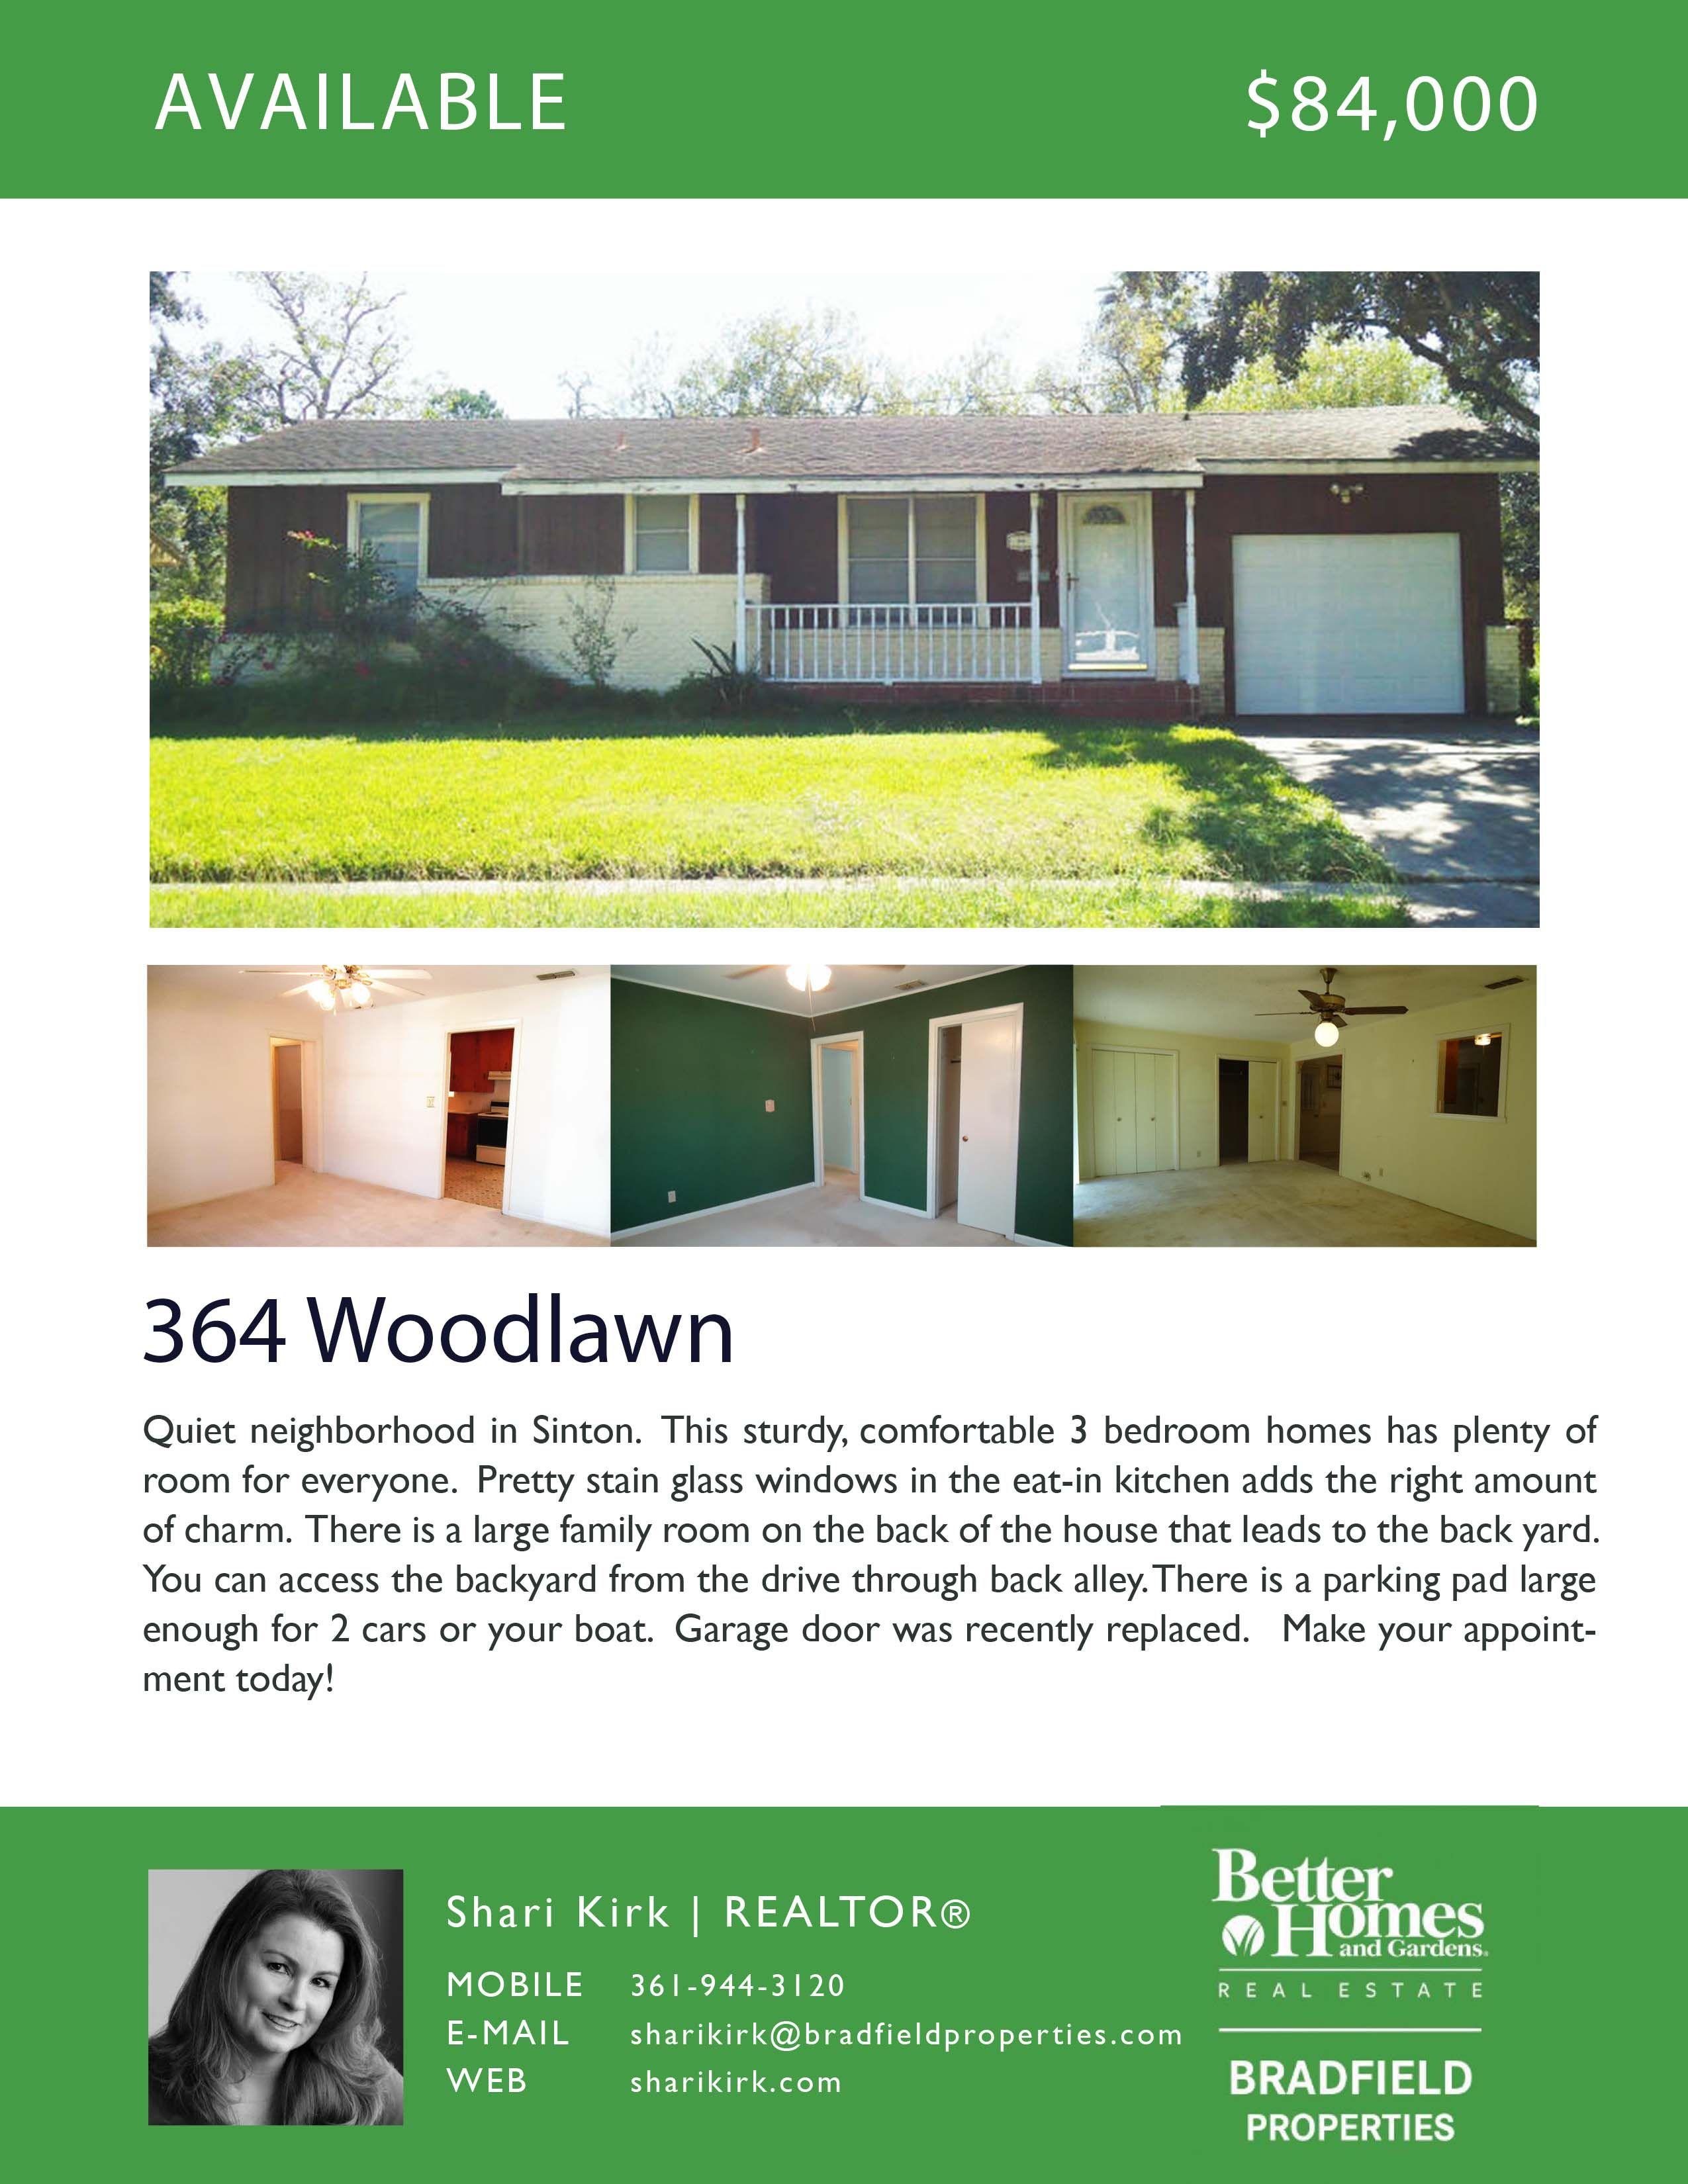 2cd7feb7a2ae6e1ee35c104ad17cbd1f - Better Homes And Gardens Bradfield Properties Corpus Christi